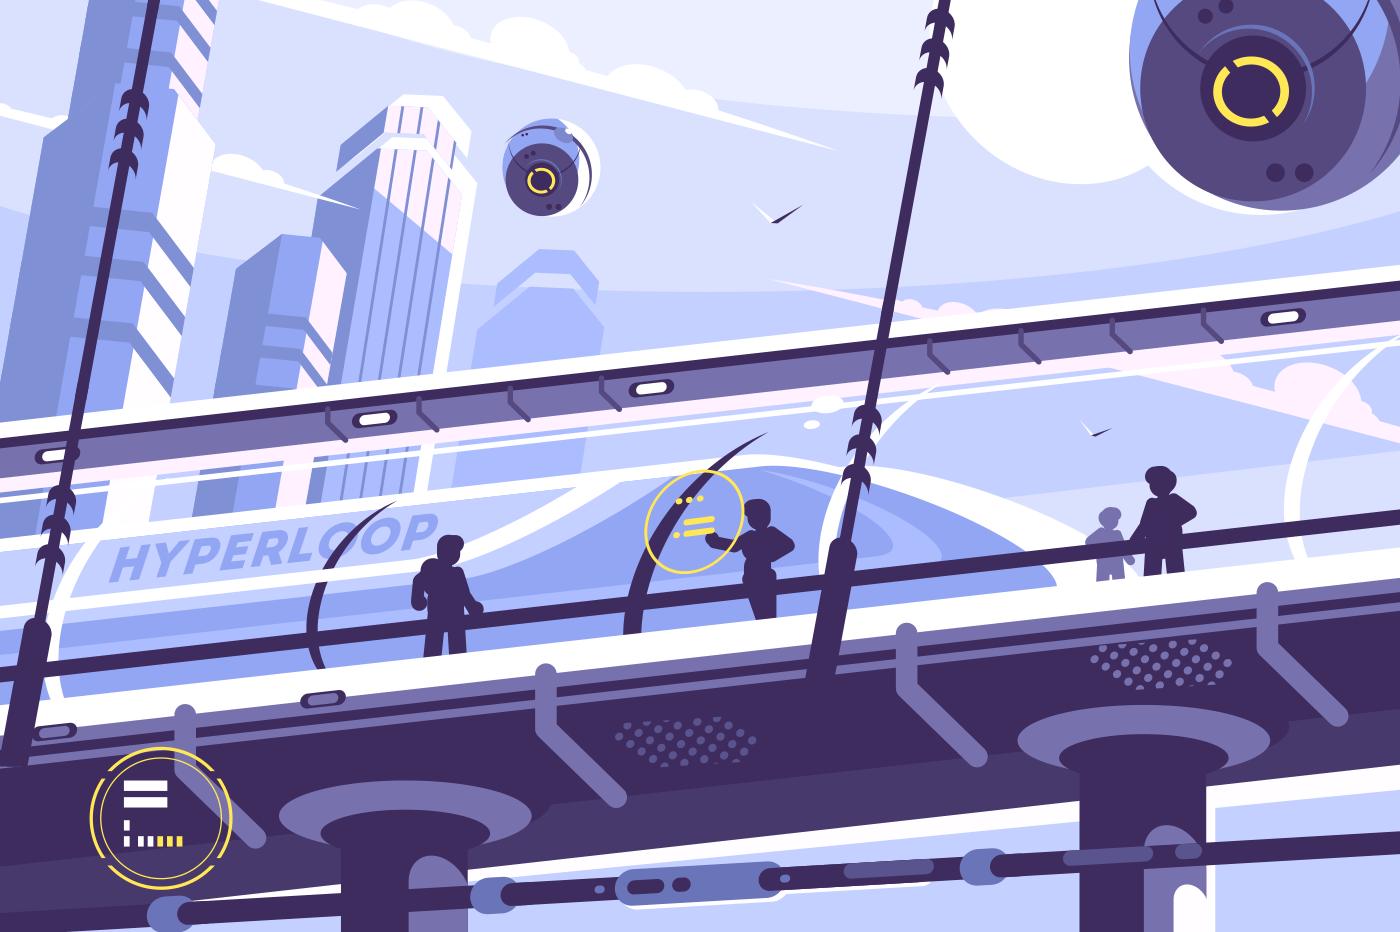 Hyperloop future public transport. Suspended tunnel for train. Vector illustration